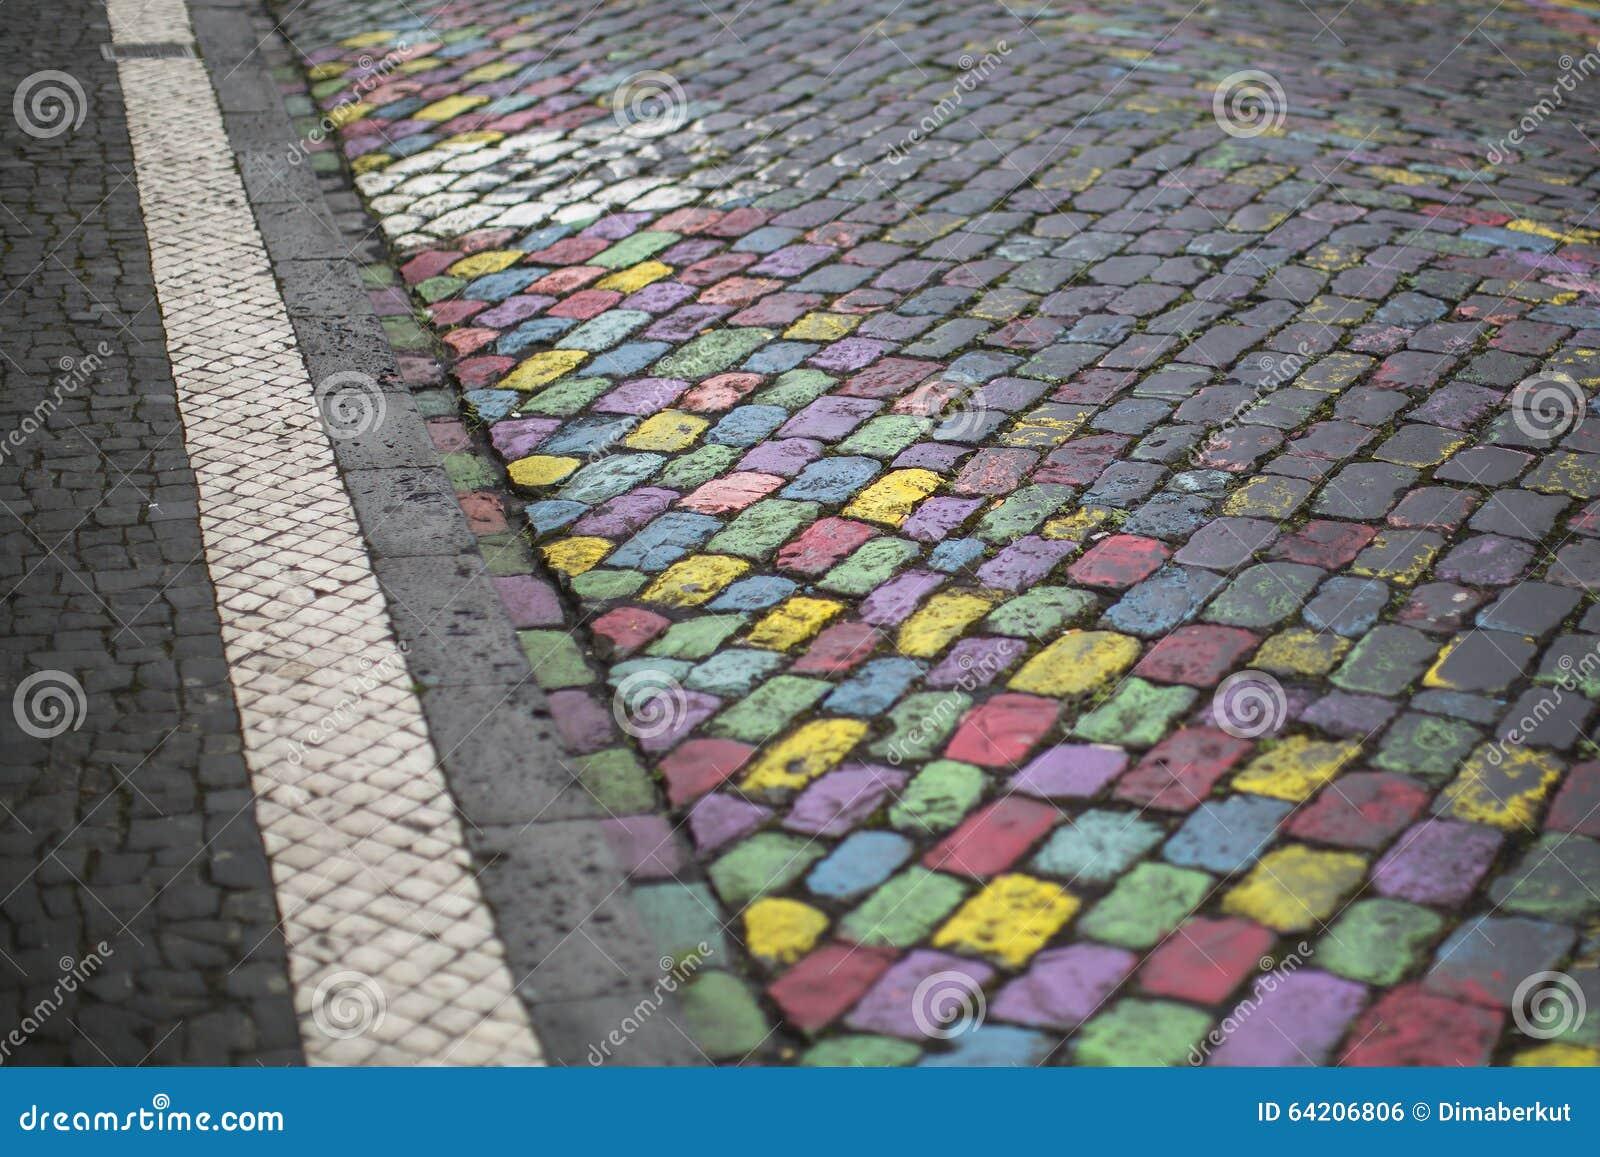 Diversos colores brillantes pintados pavimento de piedra Extracto